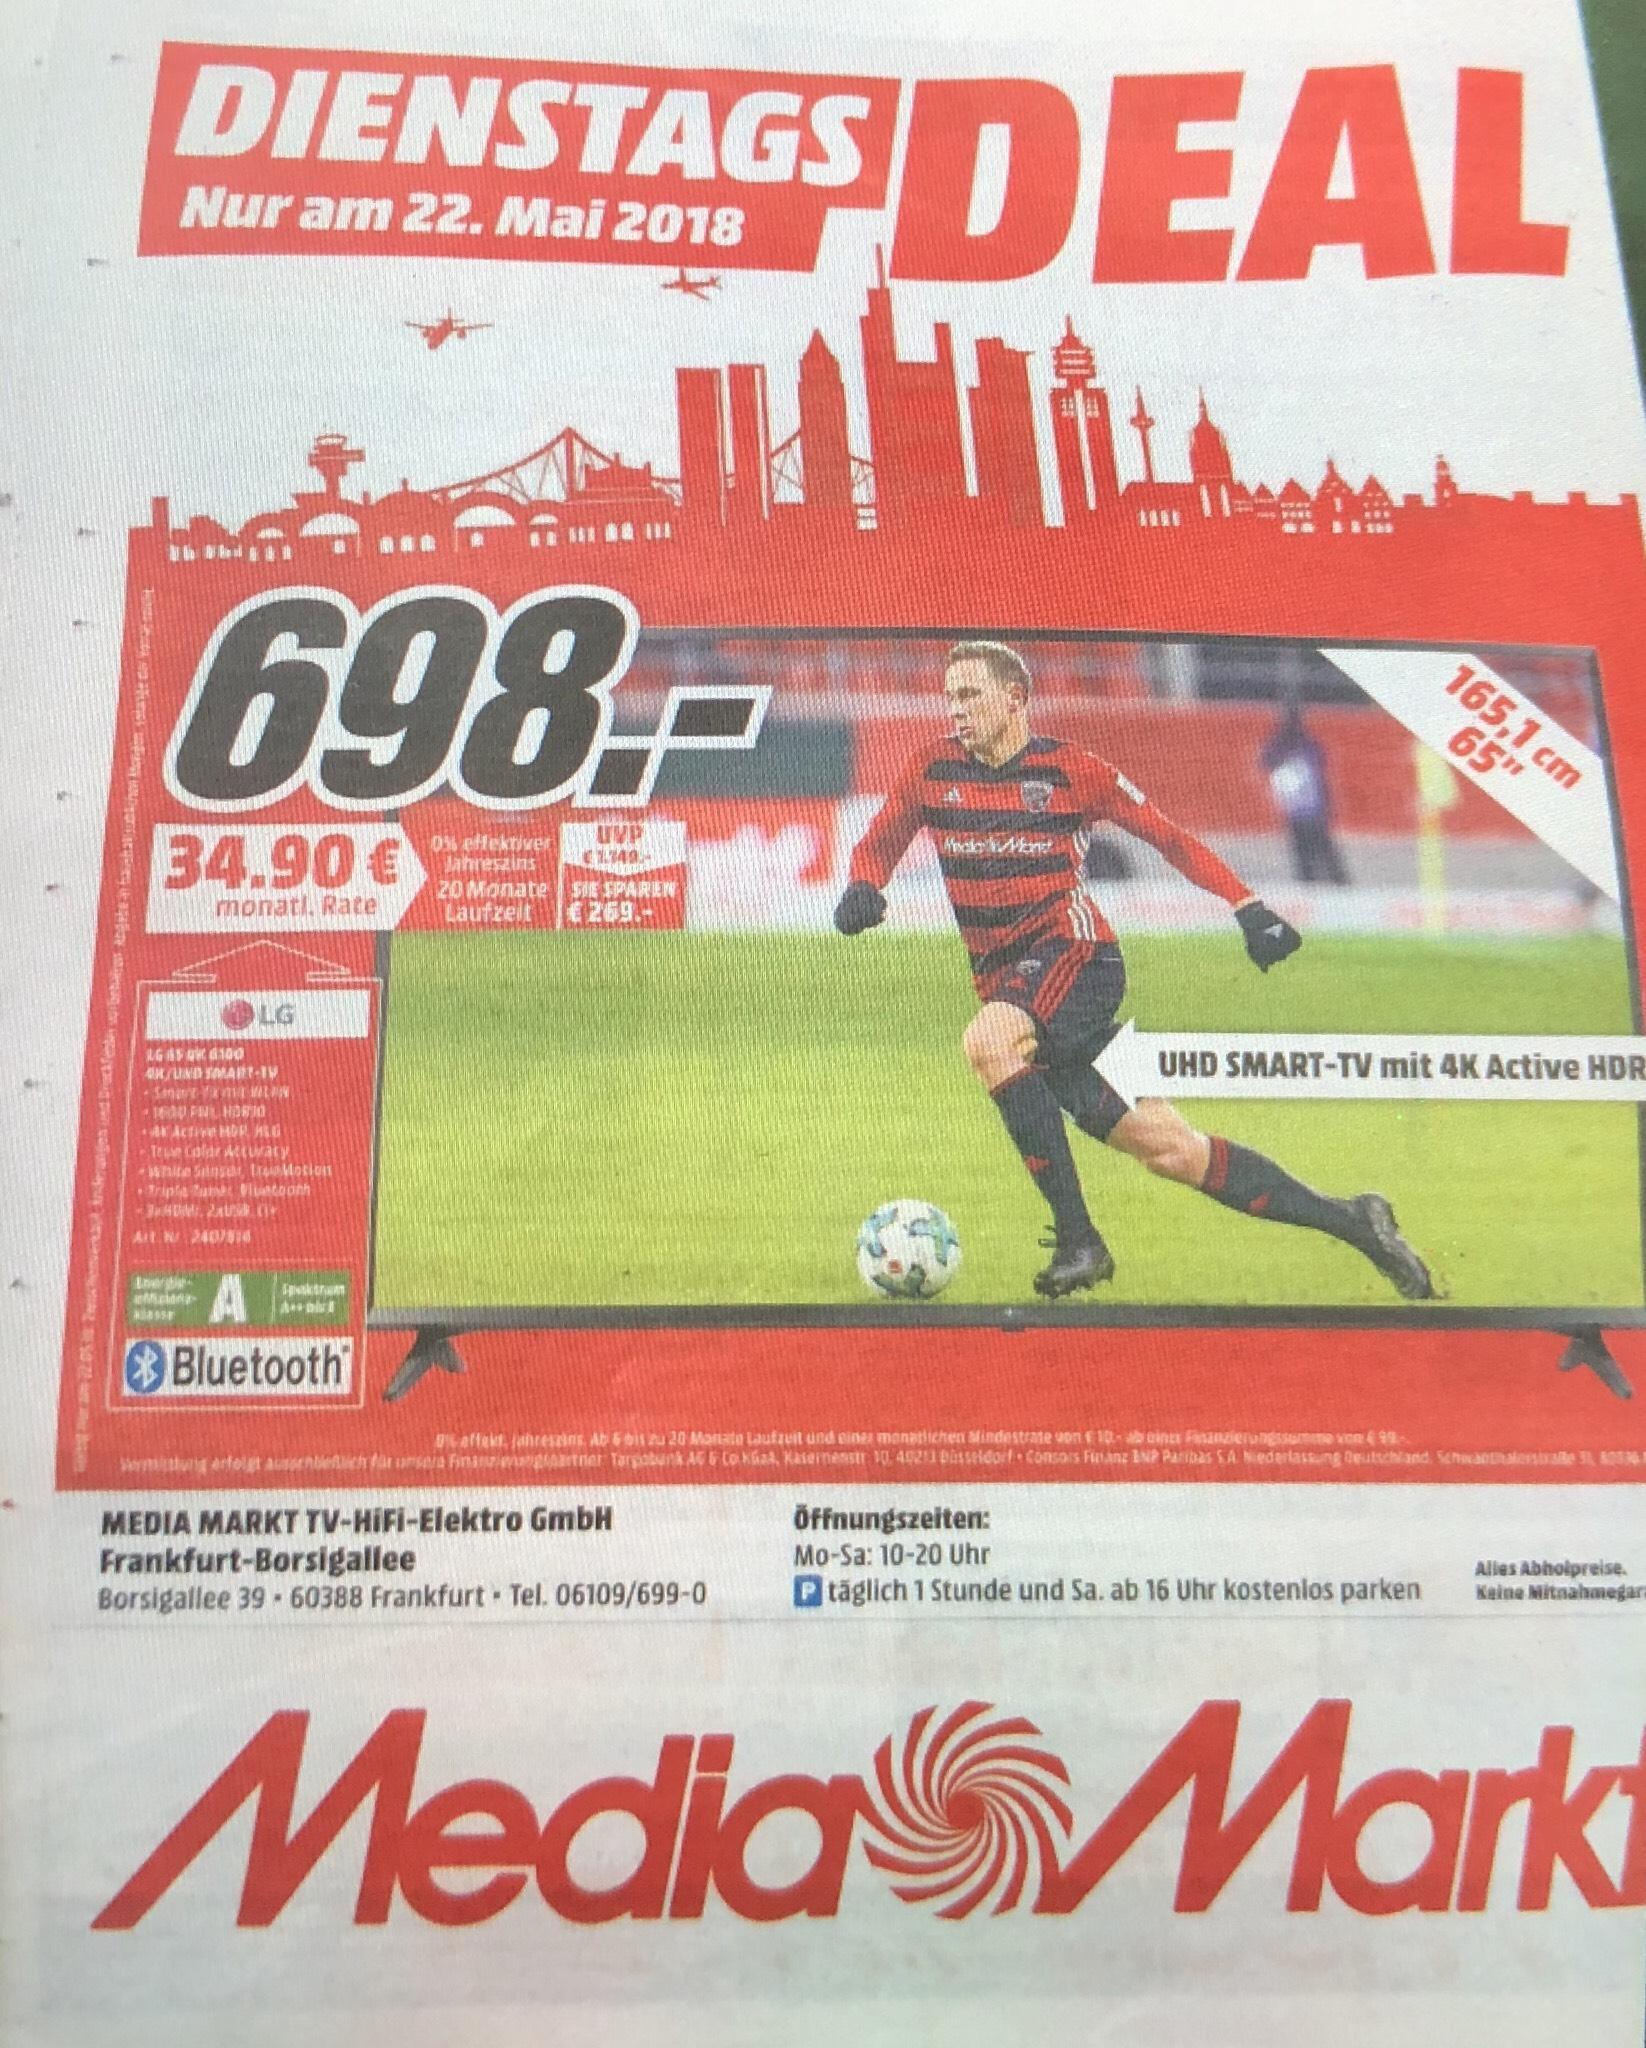 "LG 65UK6100 UHD TV ""DienstagsDEAL"" nur am 22.Mai.18 im Mediamarkt Borsigallee Frankfurt"